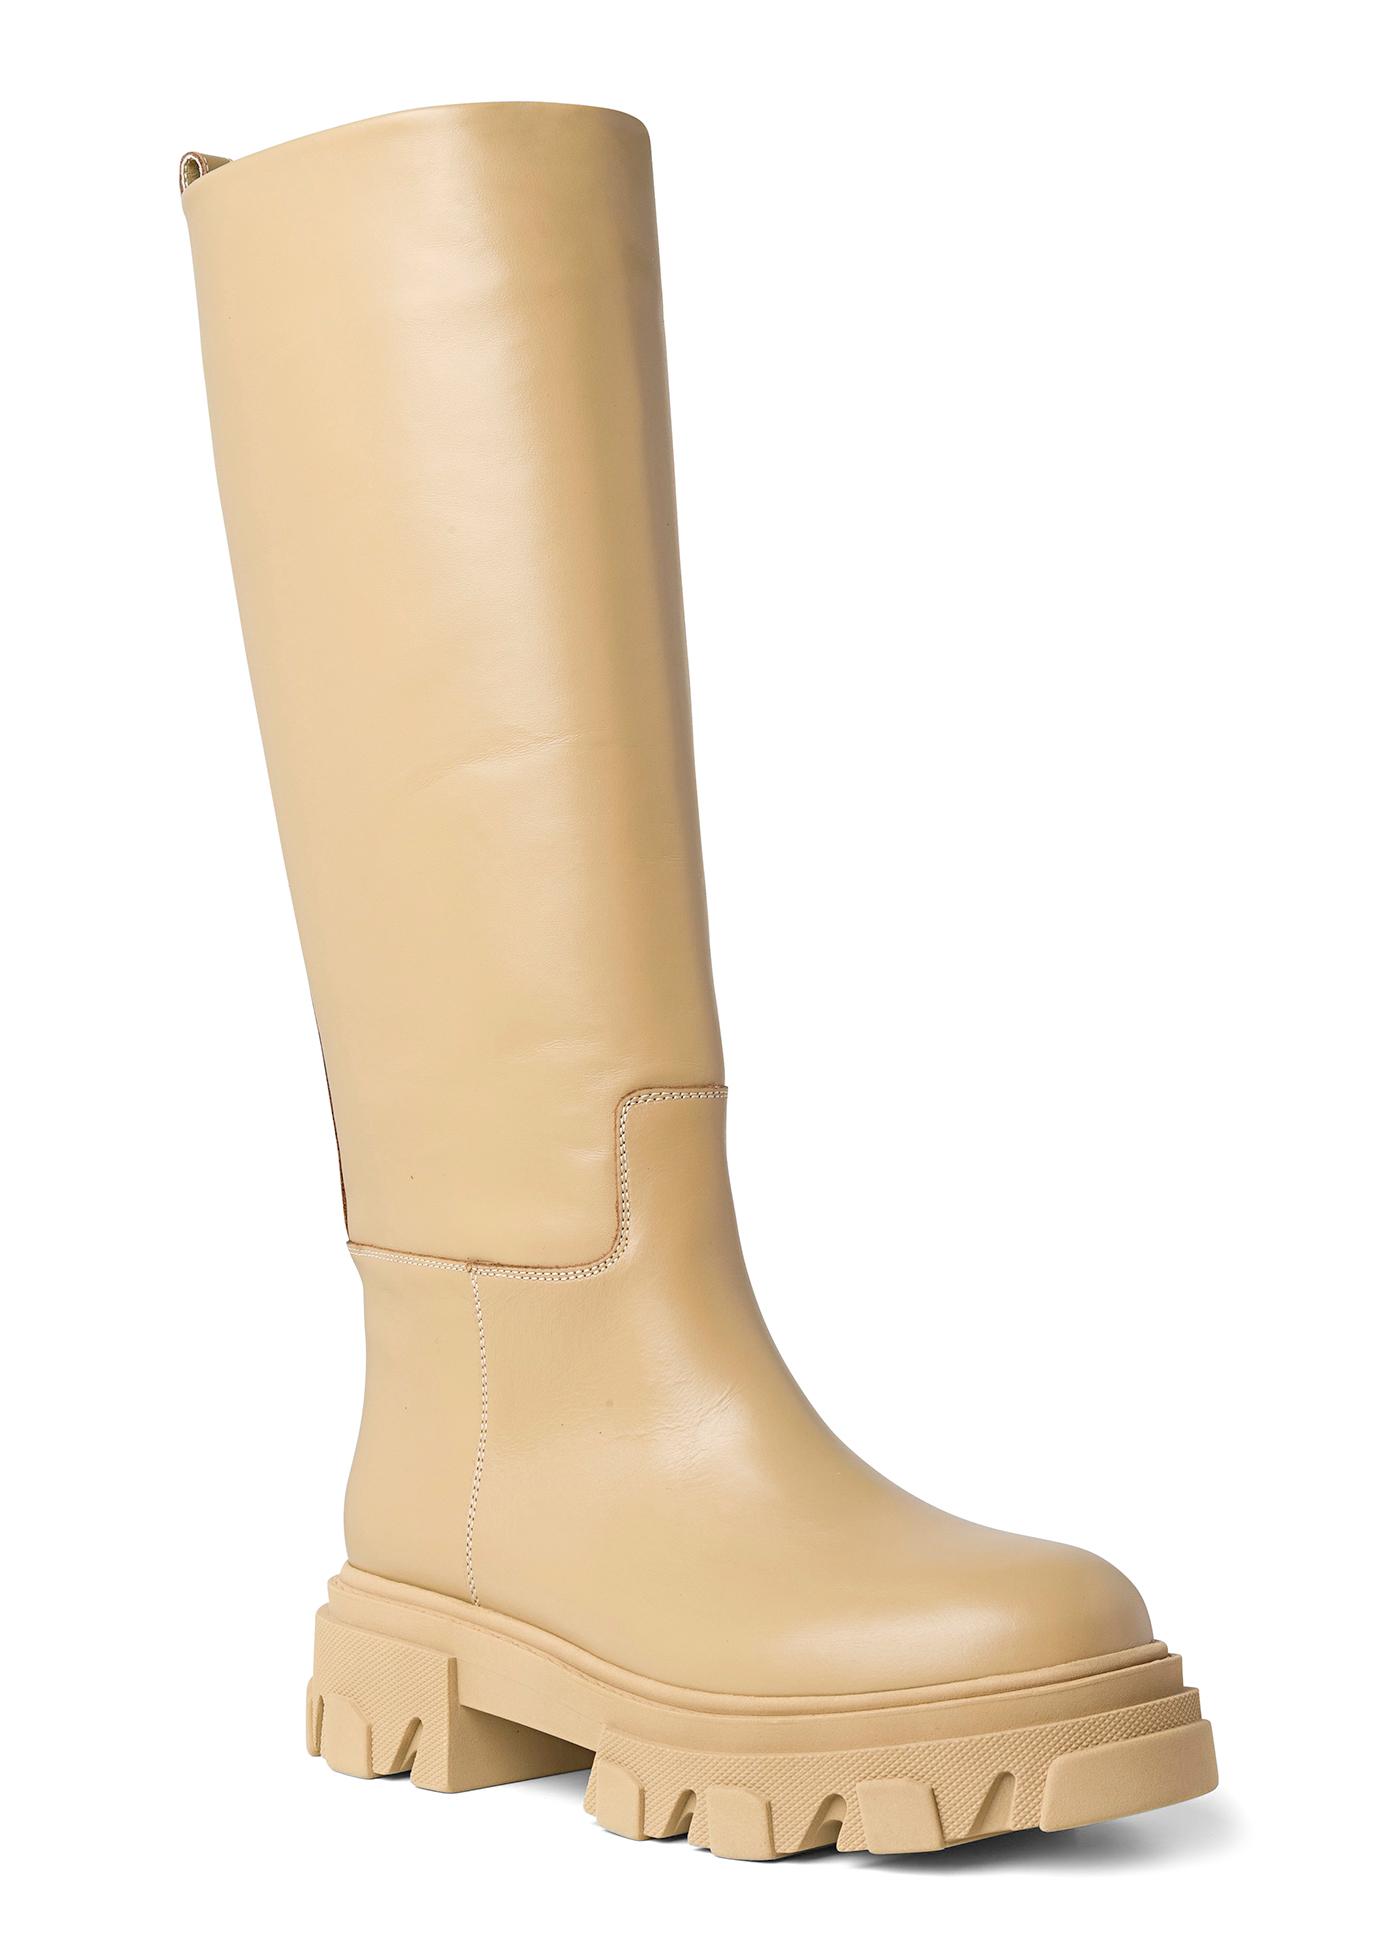 Tubular Combat Boot image number 1